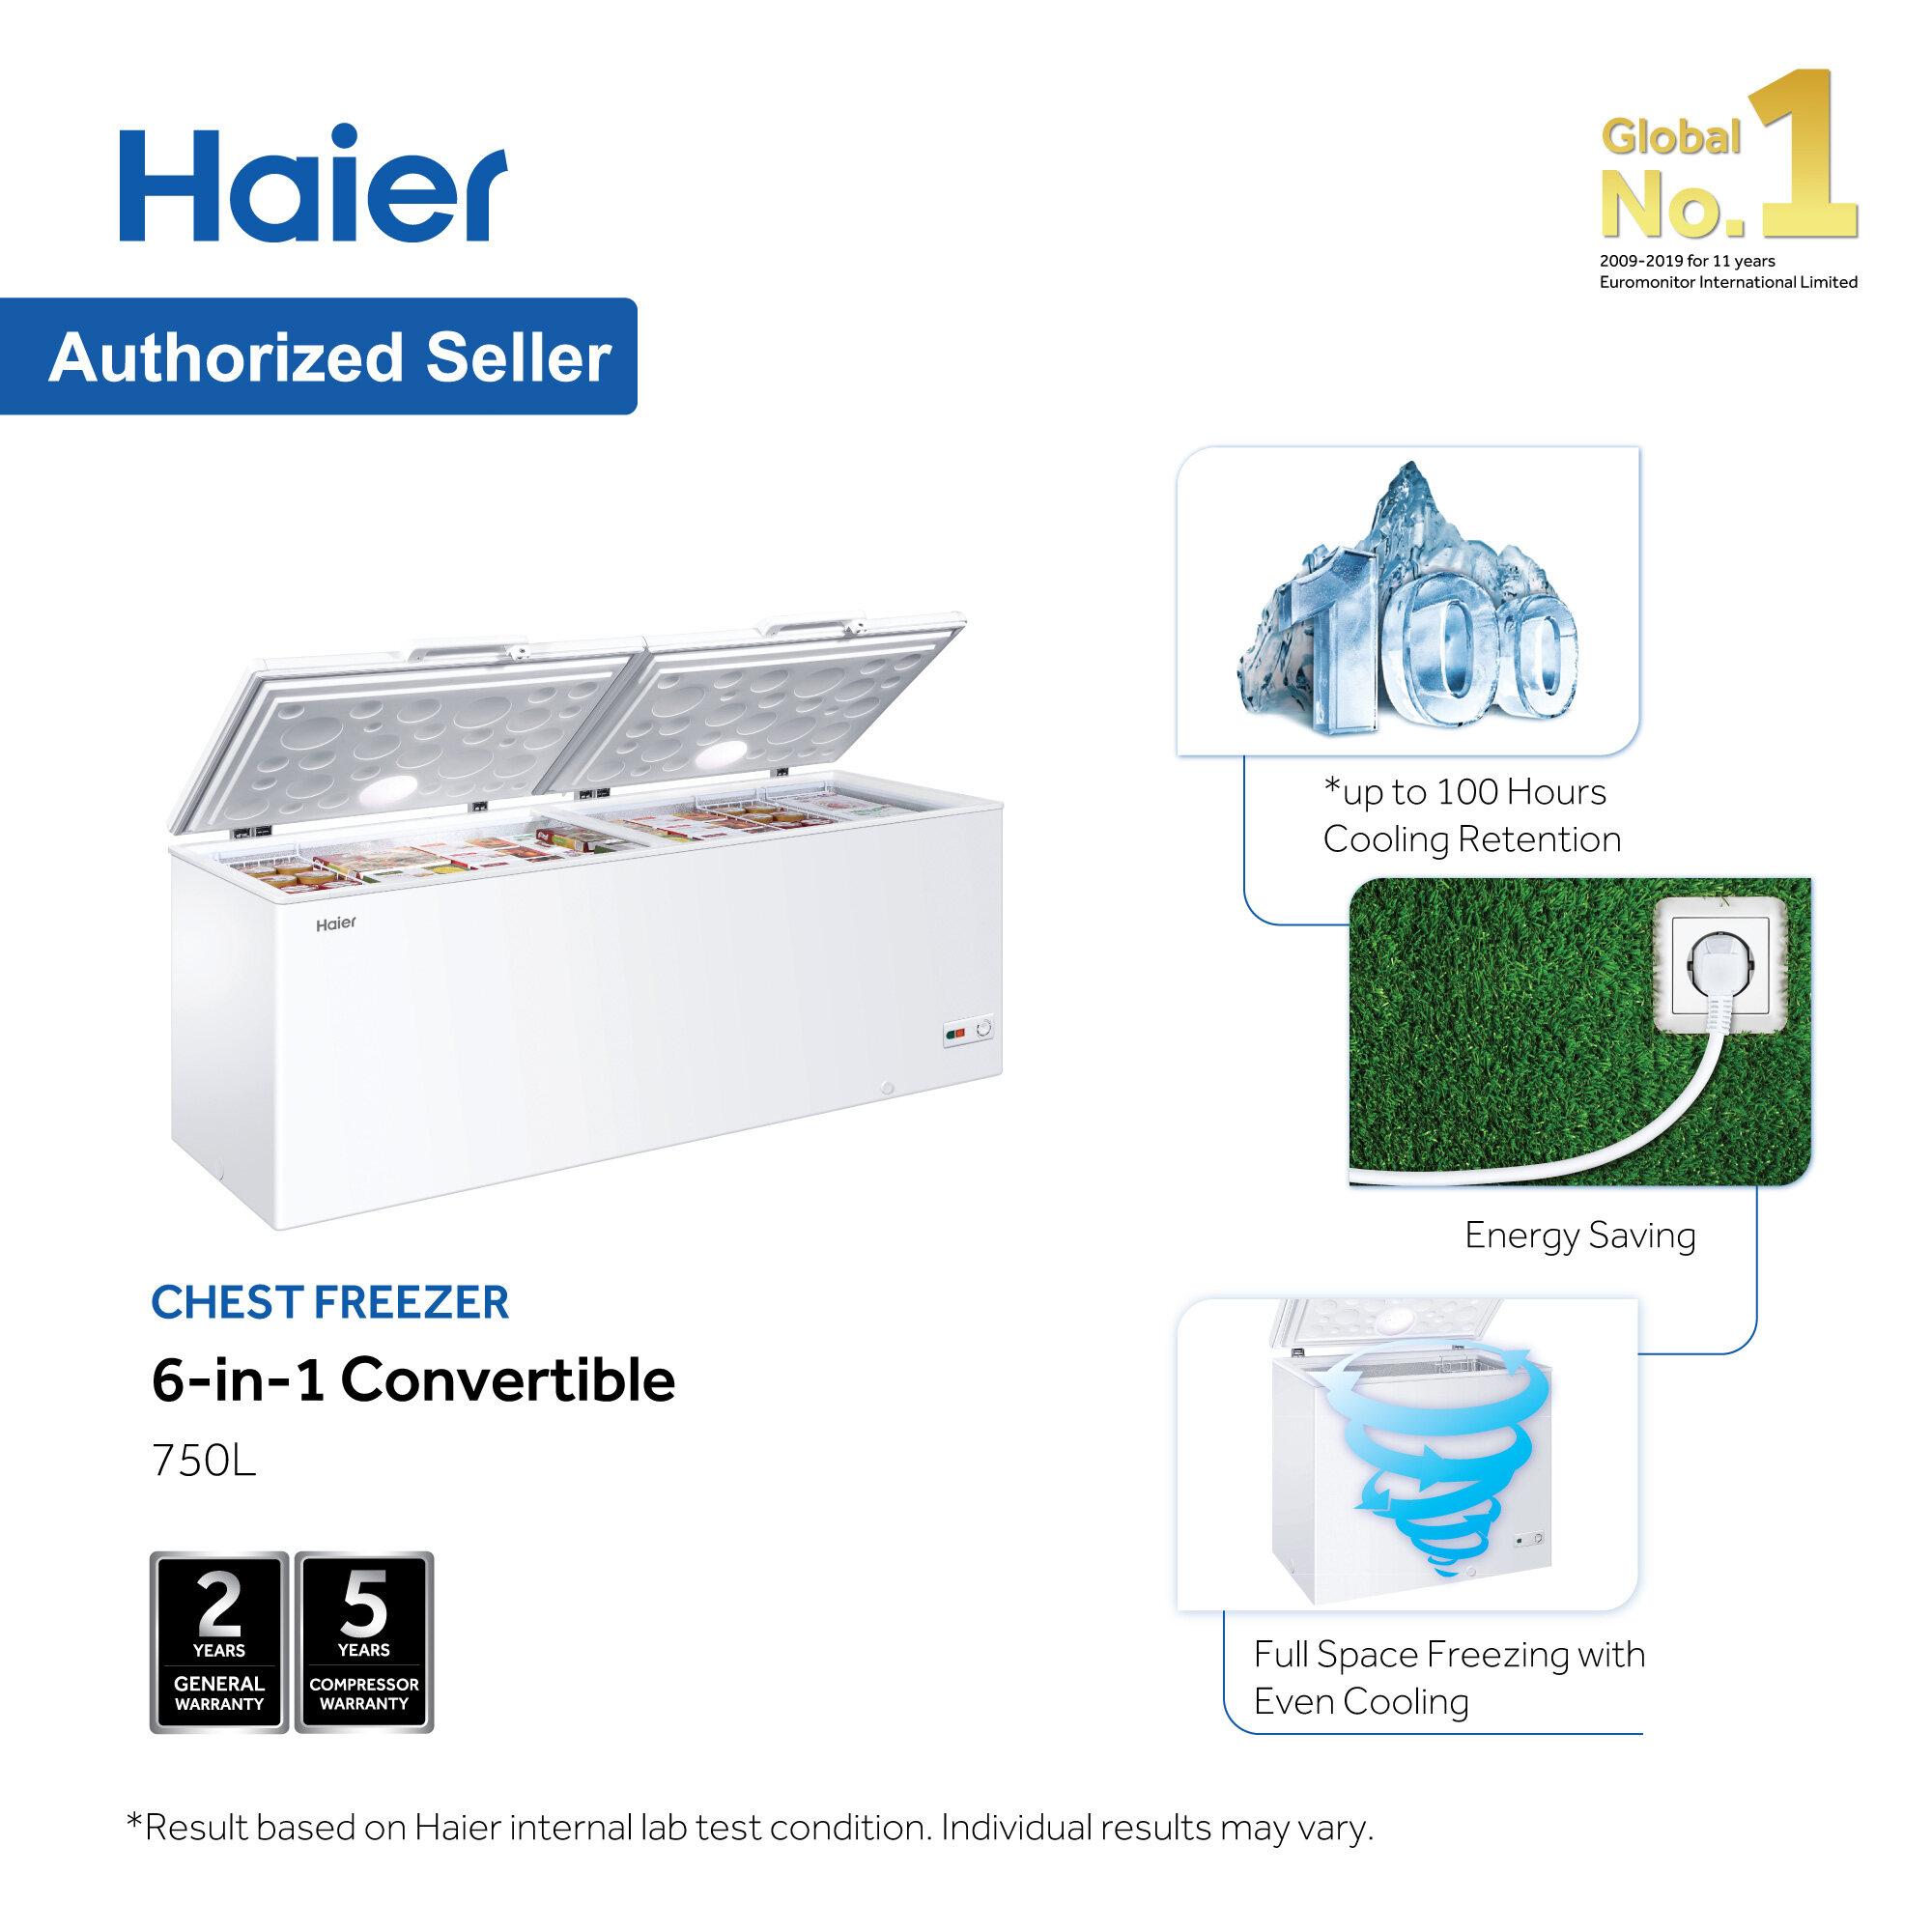 Haier 750L Chest Freezer 6 in 1 Convertible (Freezer<>Fridge)